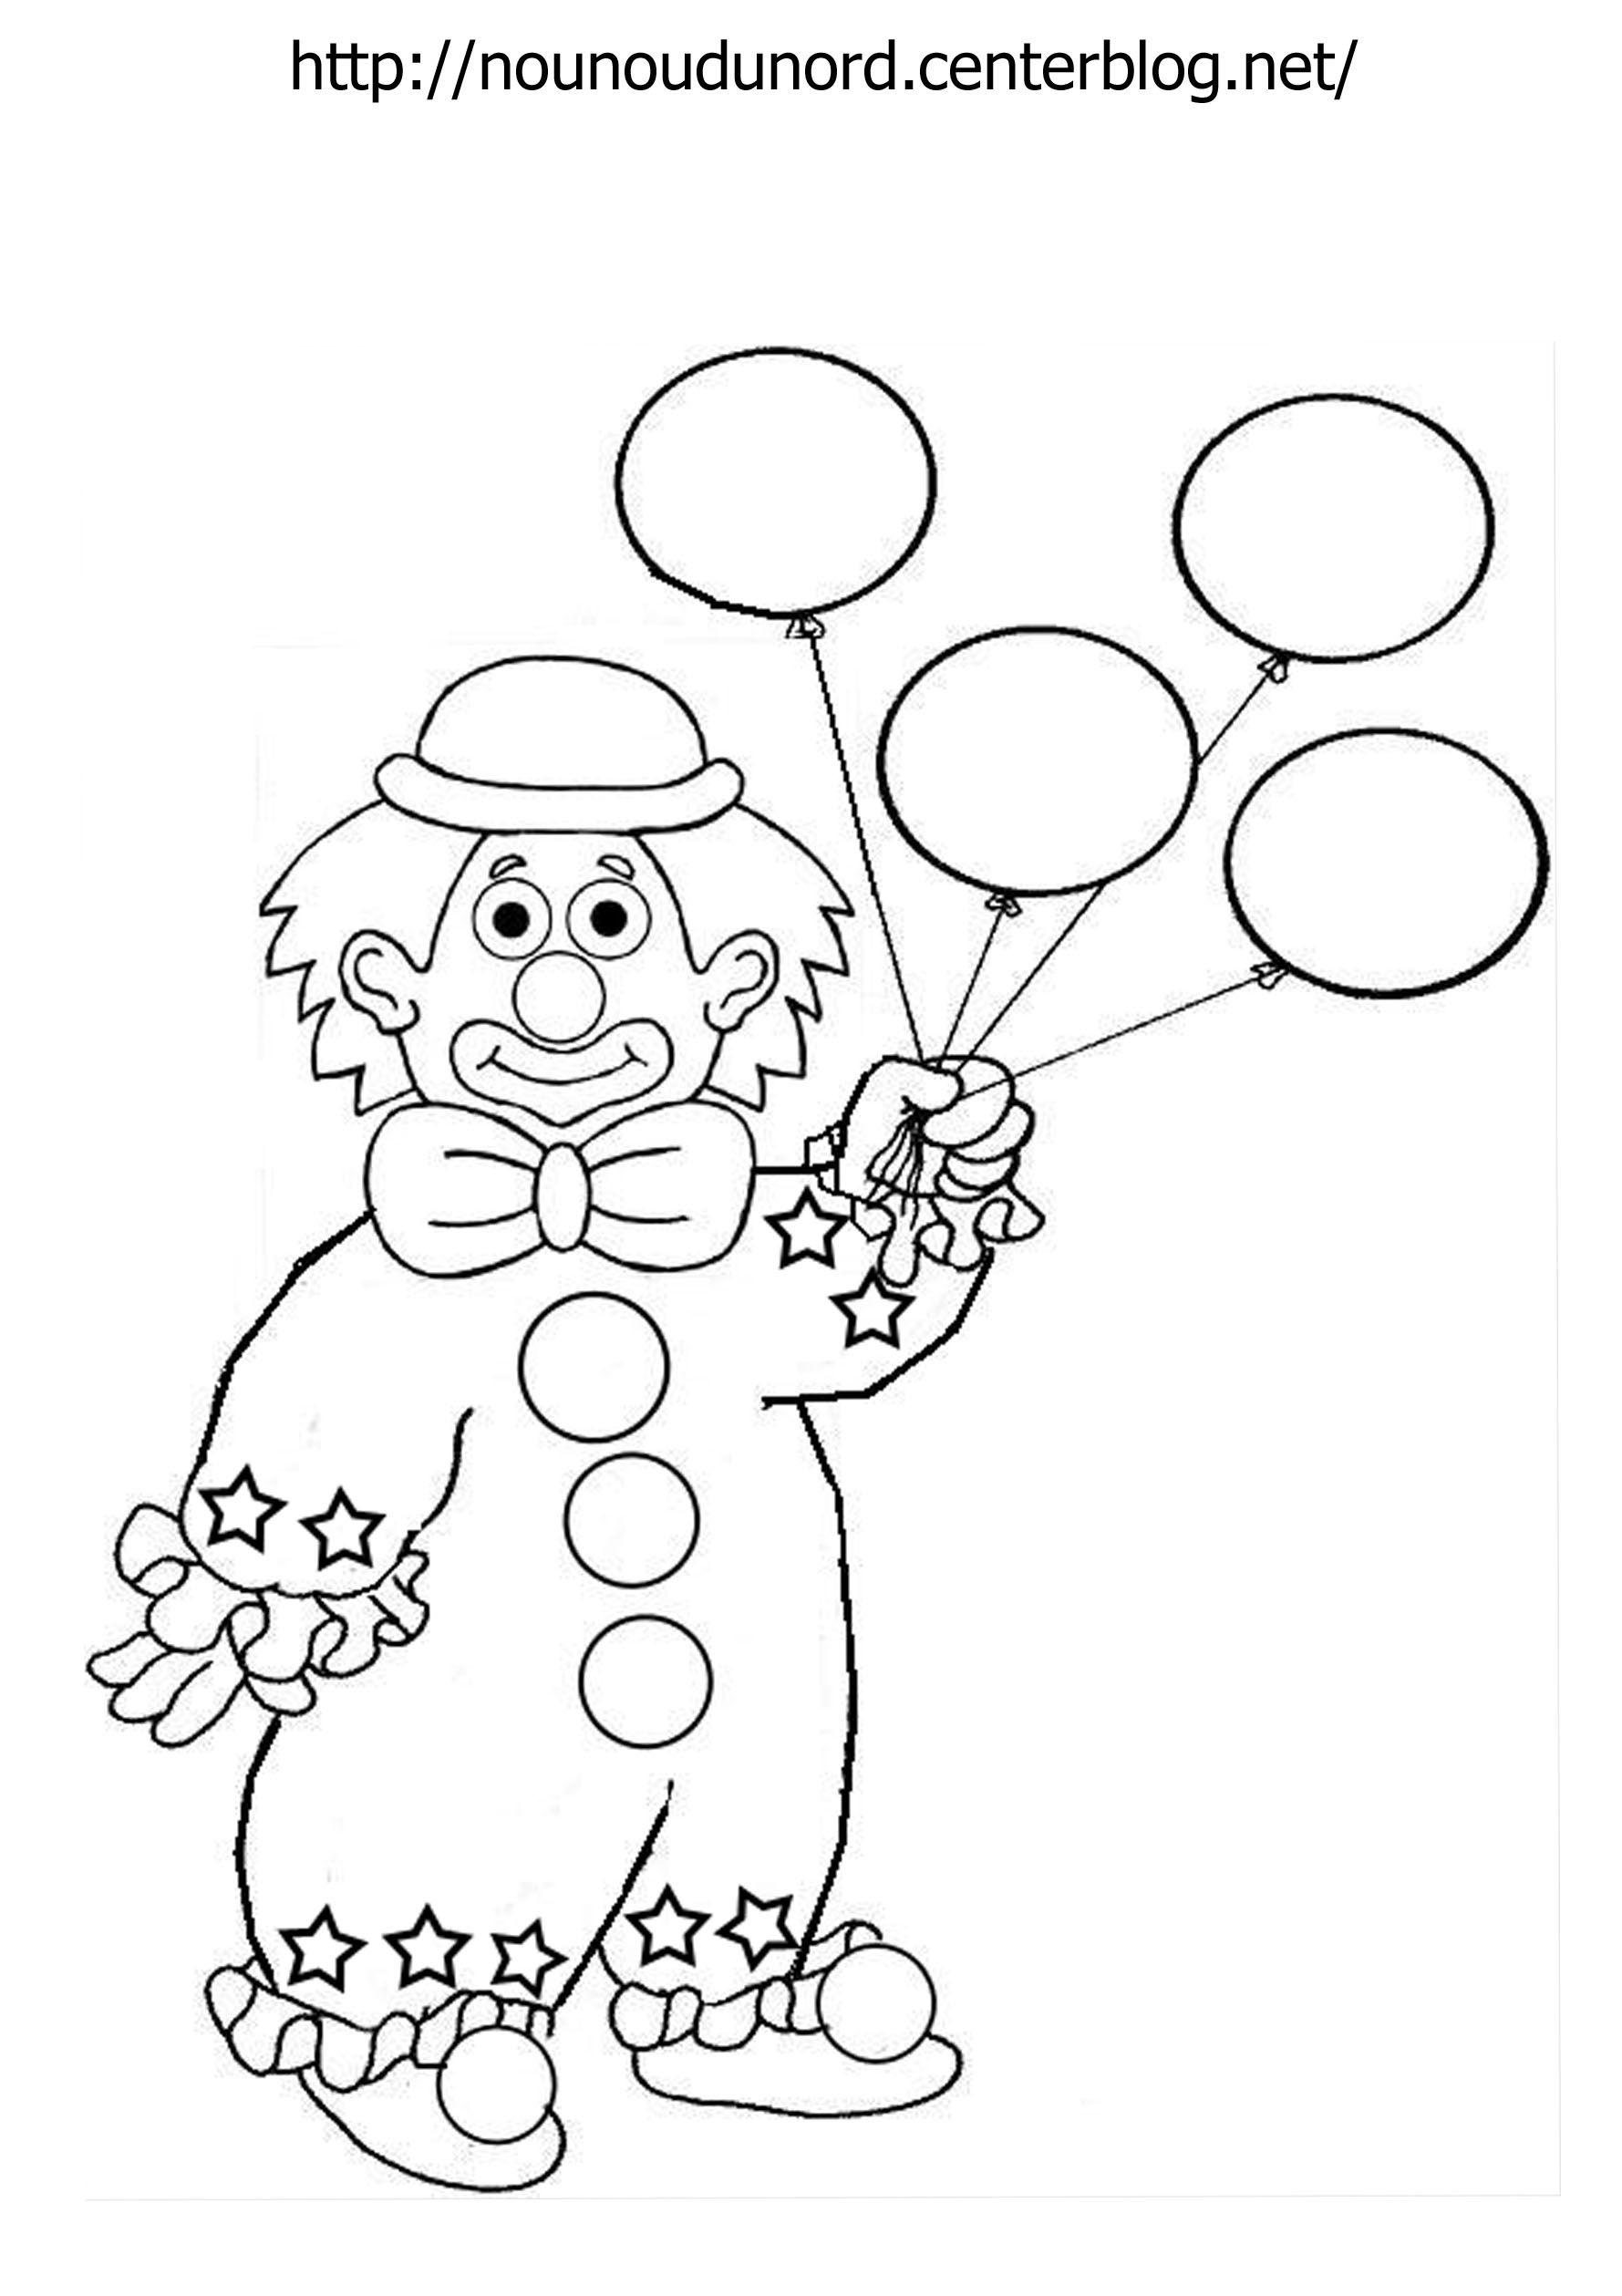 Coloriage Clown Ballon Dessiné Par Nounoudunord encequiconcerne Dessin Ballon Baudruche